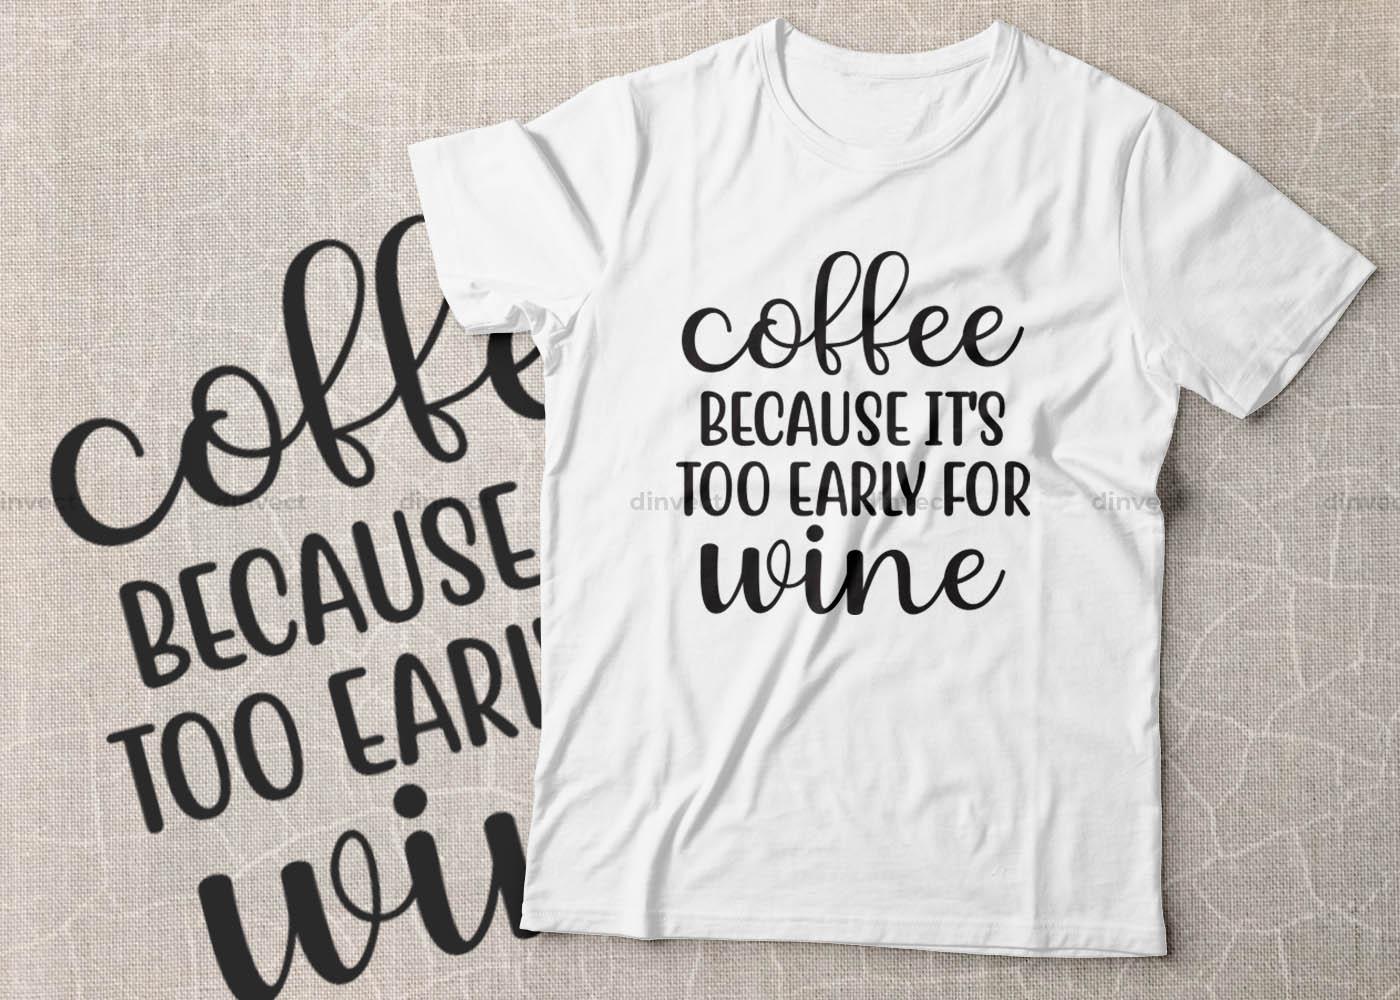 Coffee SVG, Coffee Bundle Svg, Coffee Mug Svg, Funny Coffee Quotes SVG, Mug Design Svg - Coffee because its too early for wine -